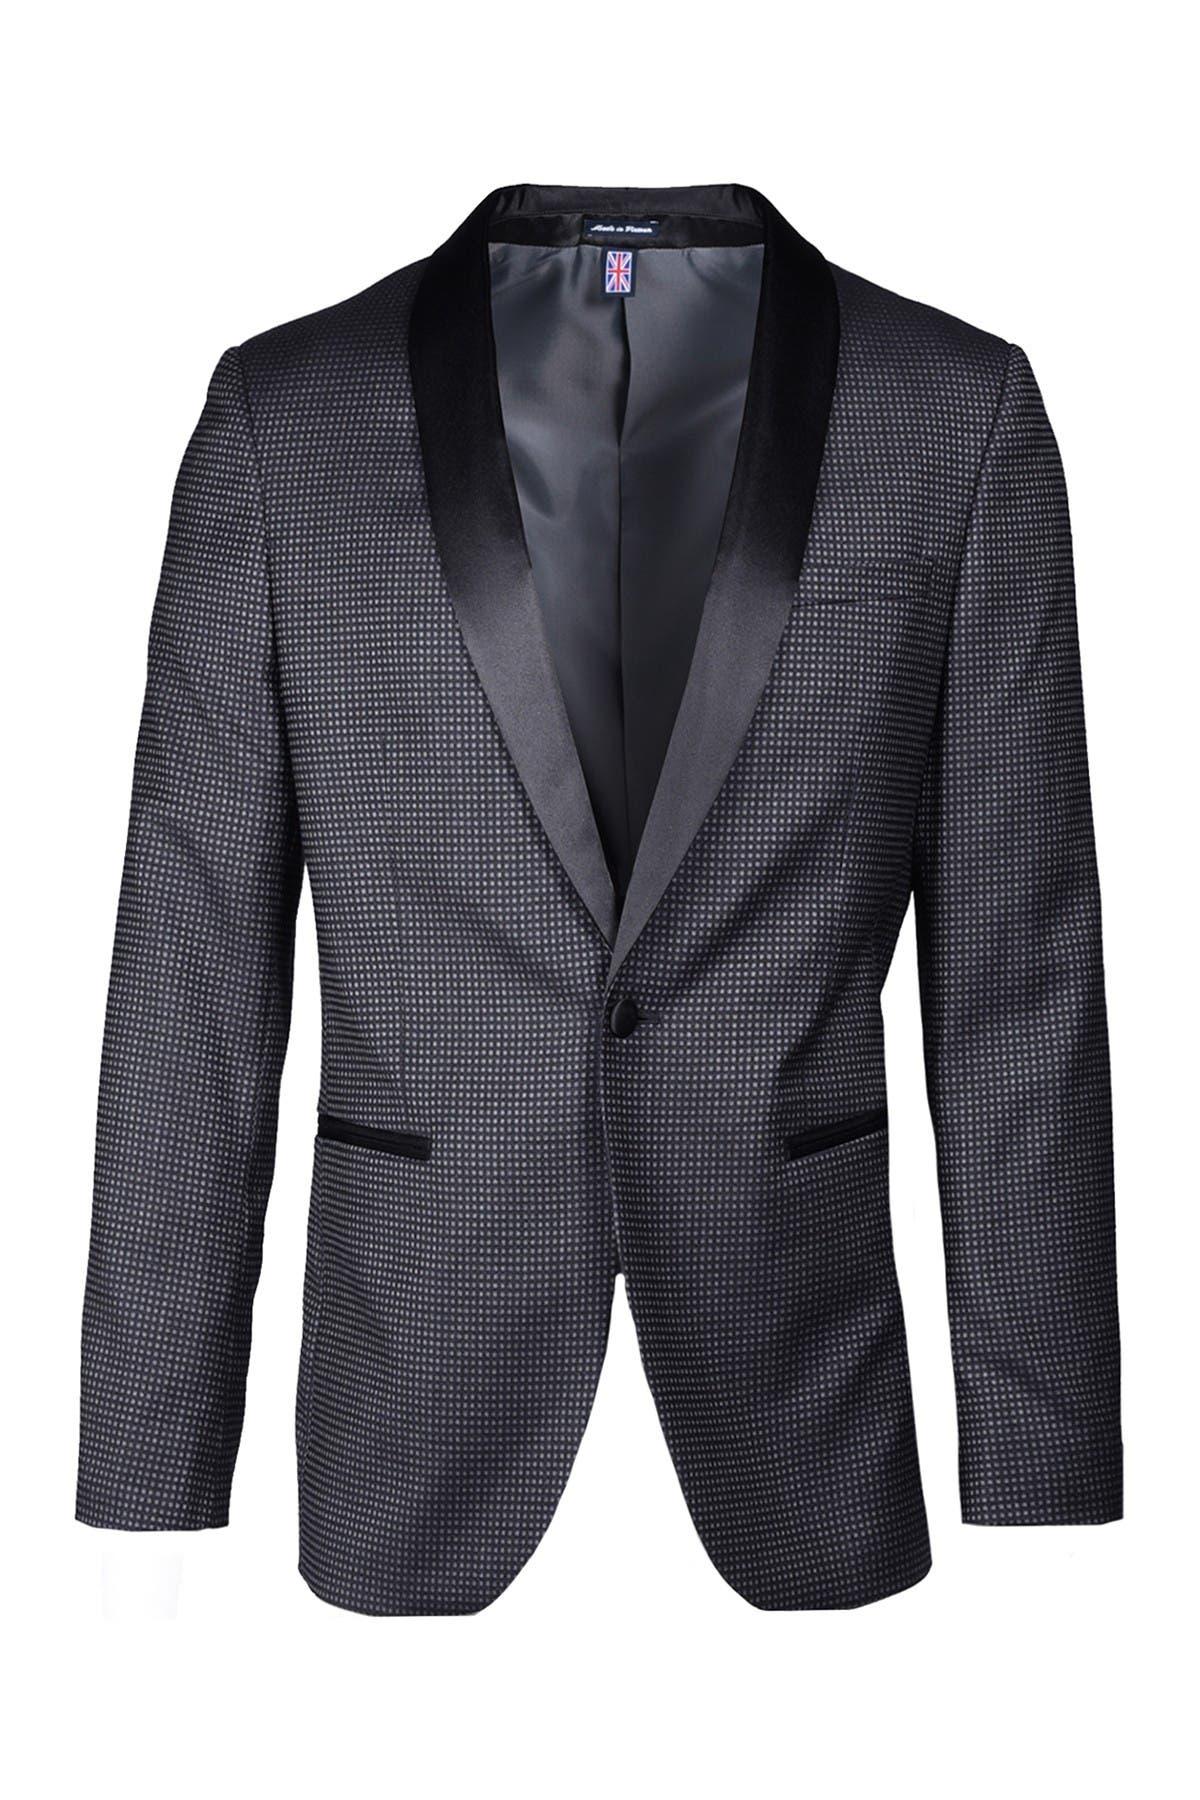 Image of SAVILE ROW CO Black Dot Satin Shawl Collar Slim Fit Evening Jacket